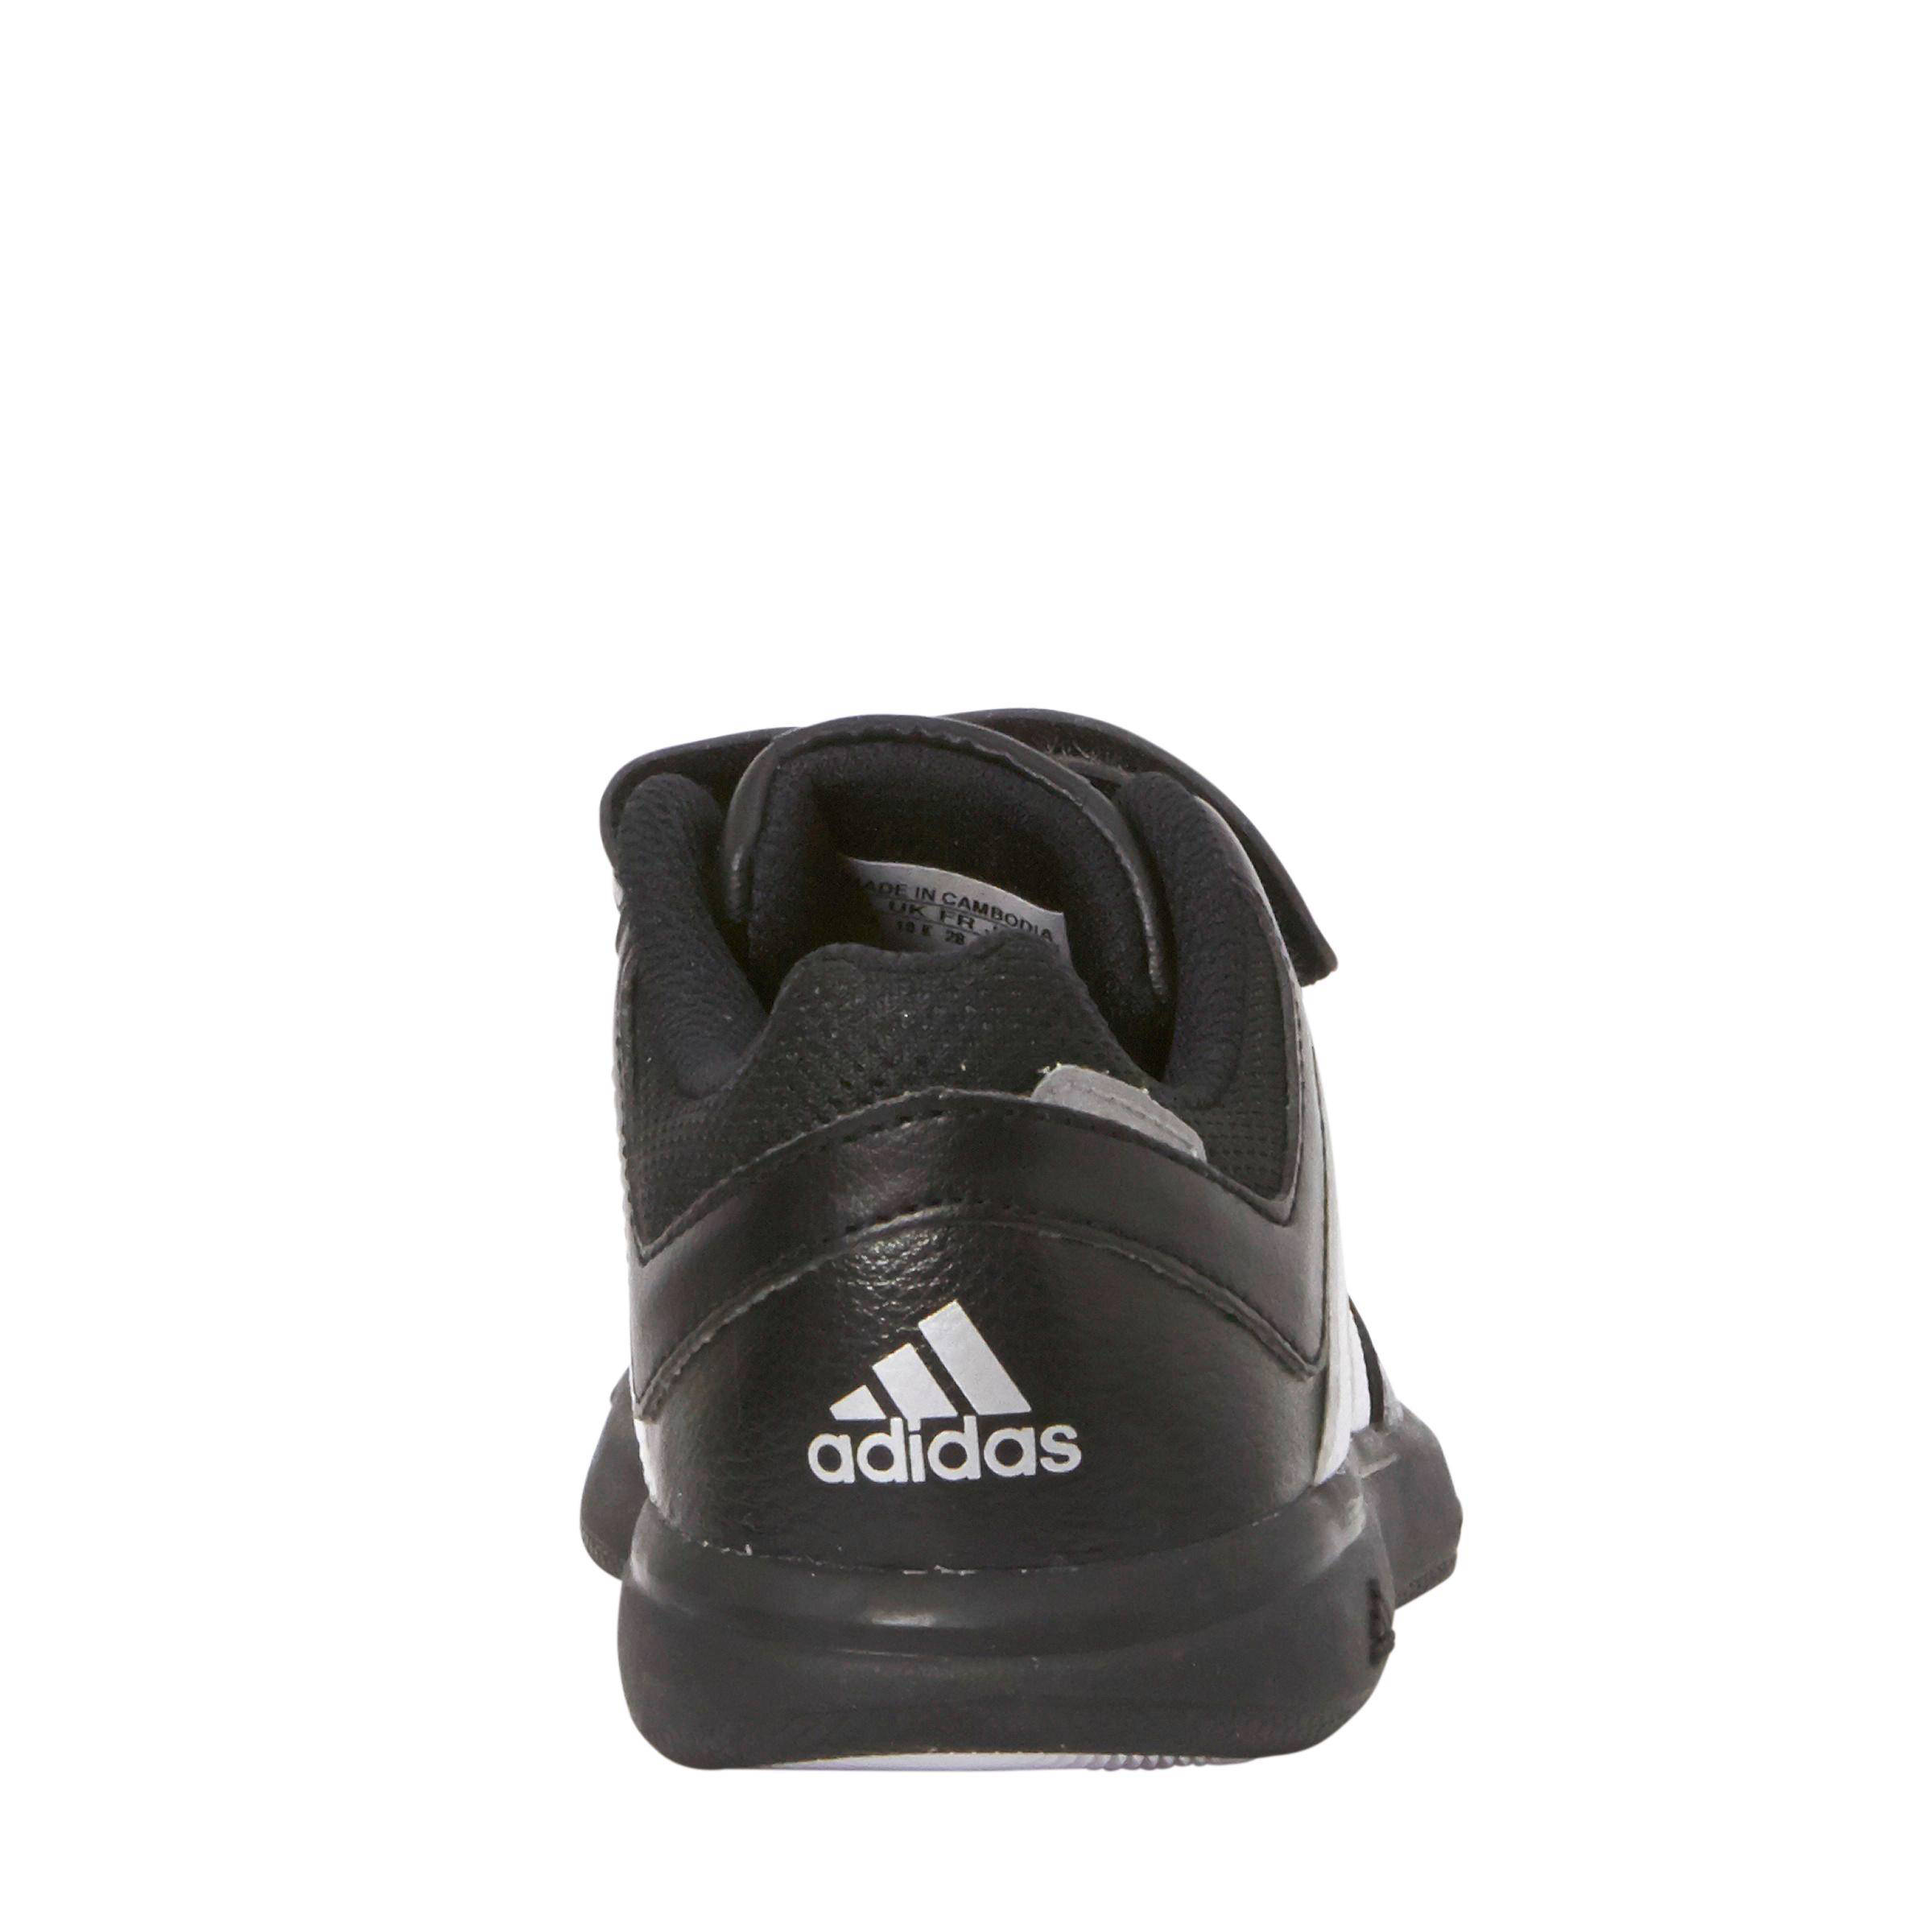 adidas performance meisjes sportschoenen LK Trainer 6 CF K